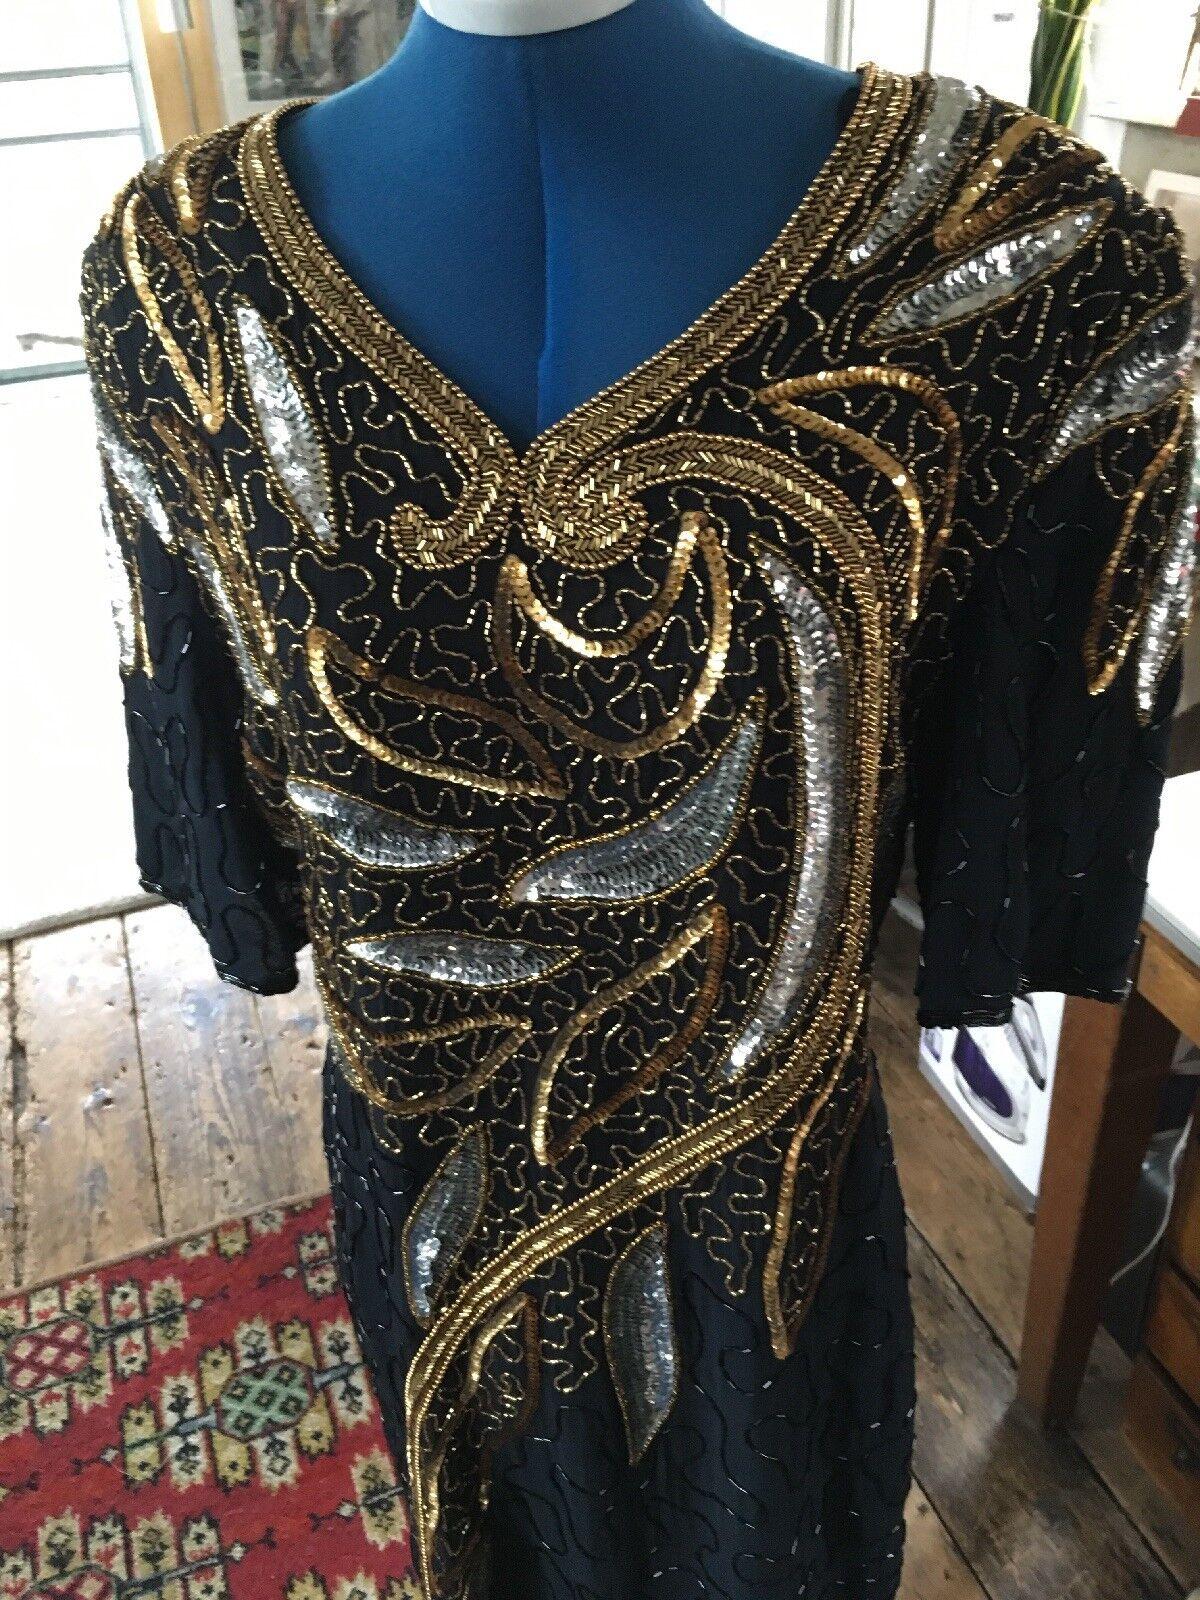 STUNNING RETRO PARTY COCKTAIL schwarz HEAVILY  SEQUINED Größe 14 DRESS 1980 90s